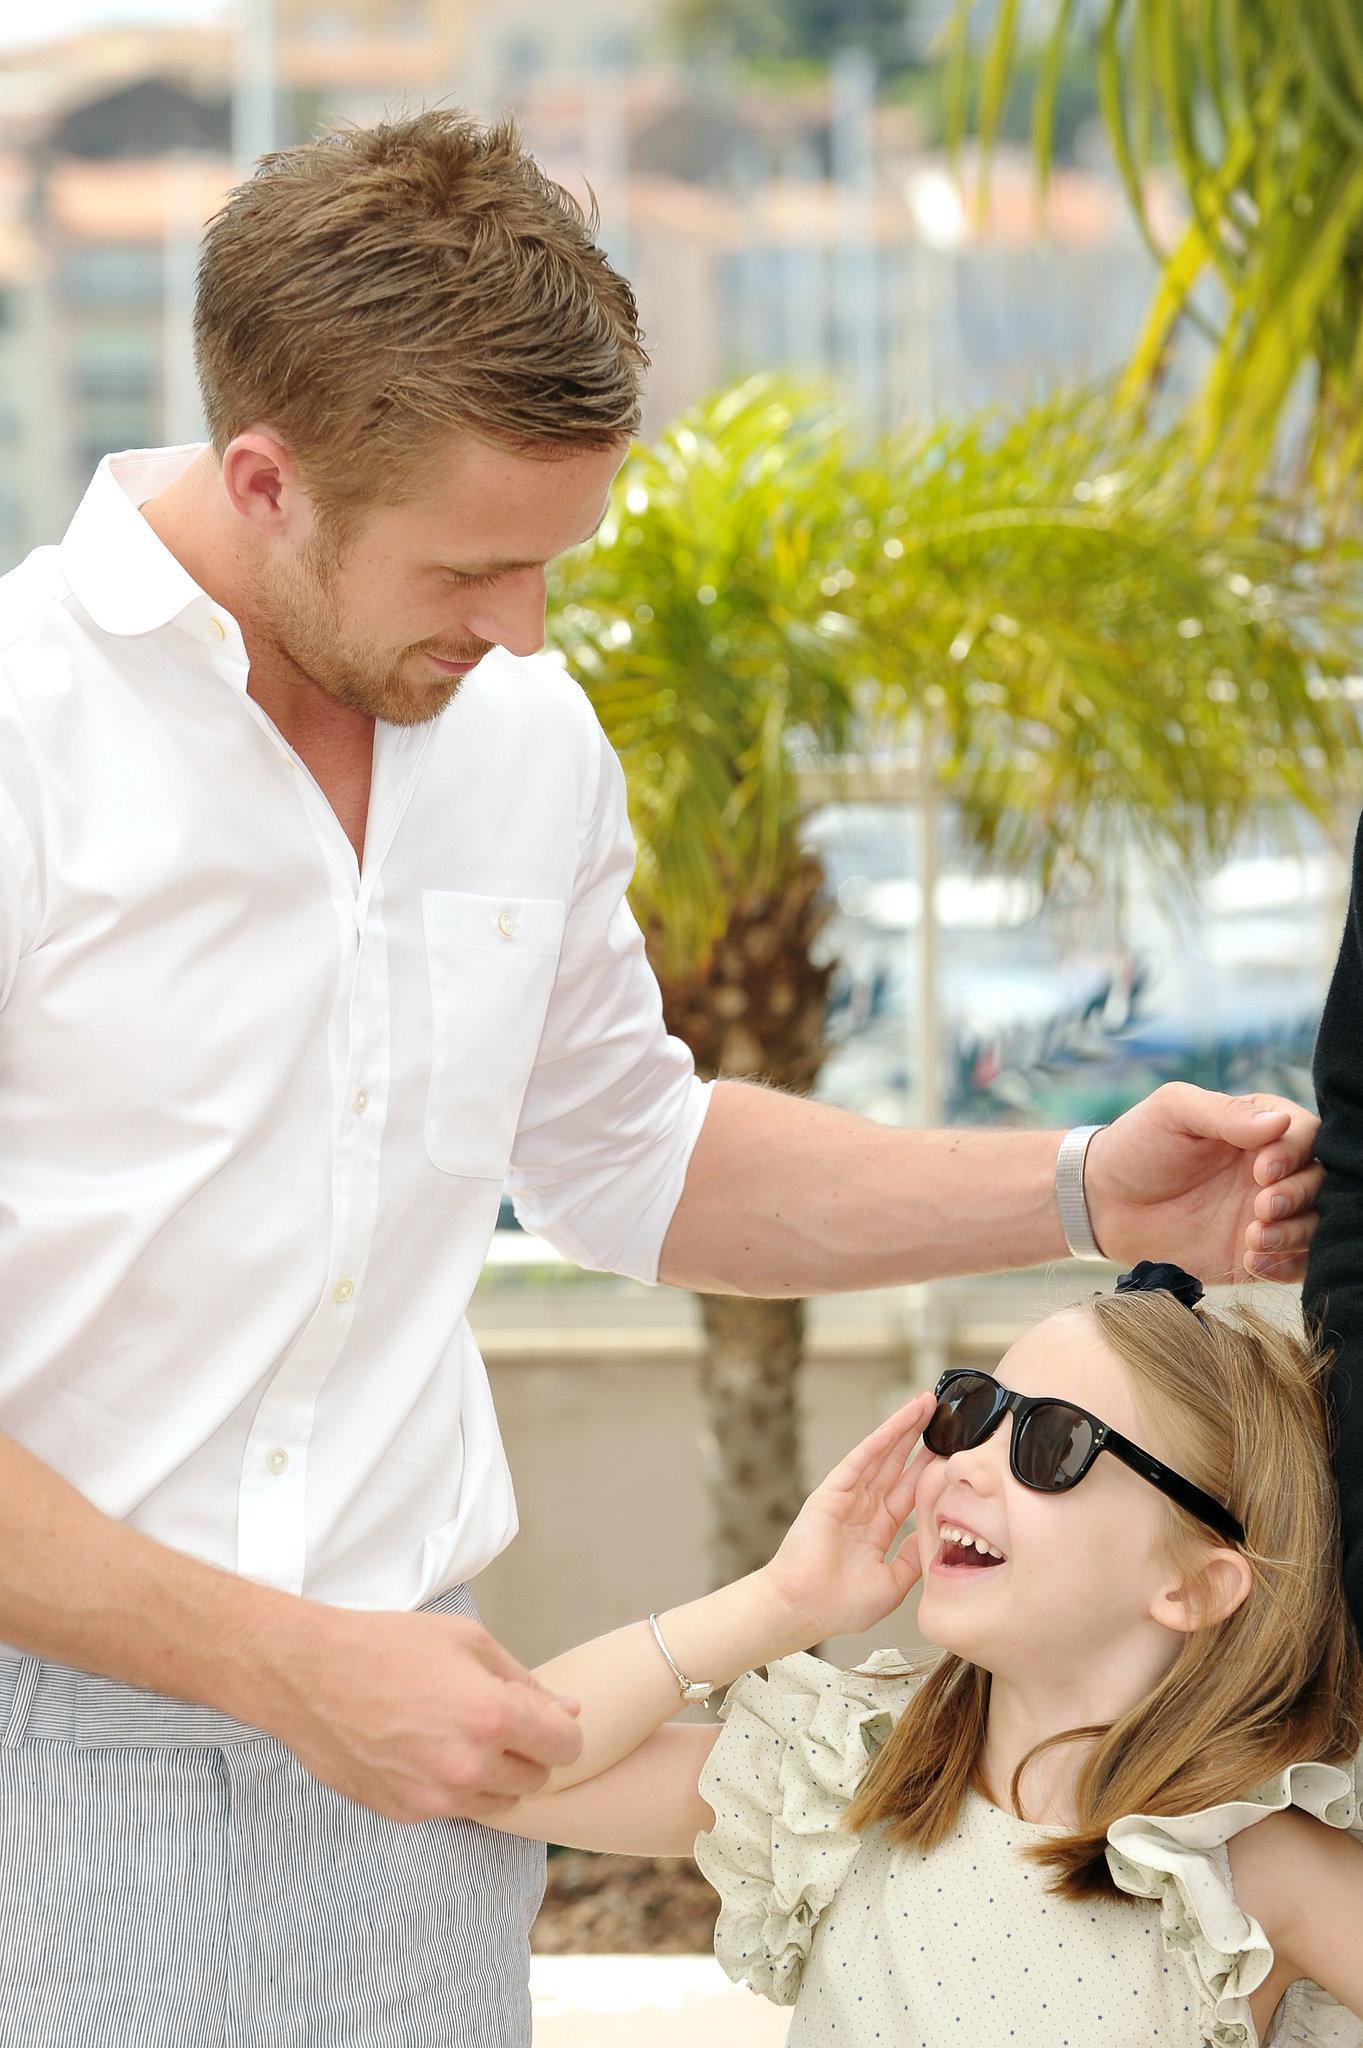 At the Cannes Film Festival, Ryan let Faith Wladyka wear his sunglasses.